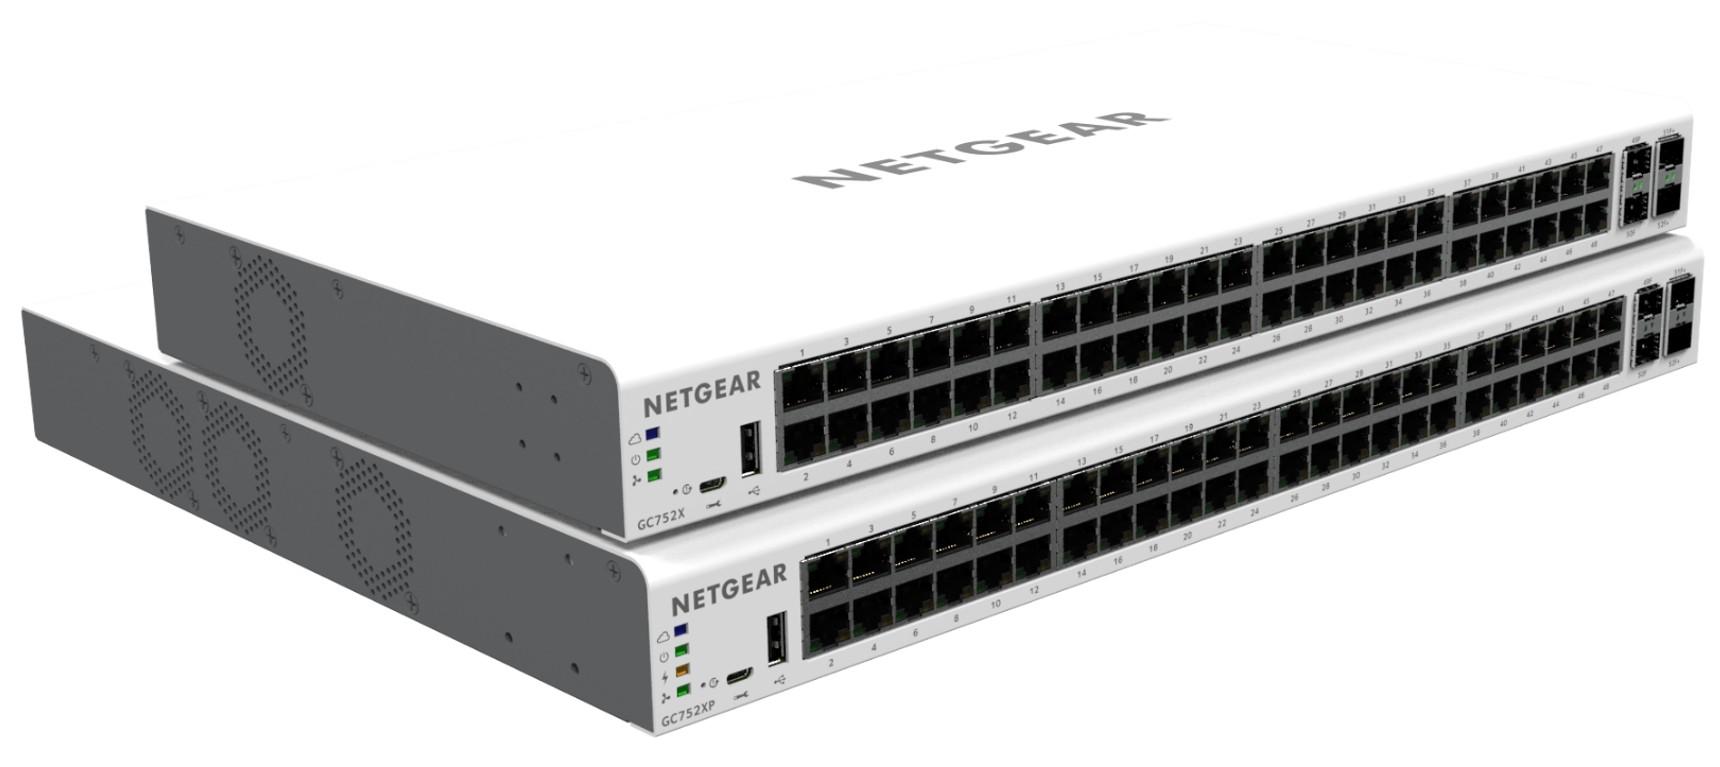 Image 1 of Netgear Insight Managed 52-port Gigabit Ethernet Smart Cloud Switch With 2 Sfp And 2 Sfp+ 10g Fibre GC752X-100AJS